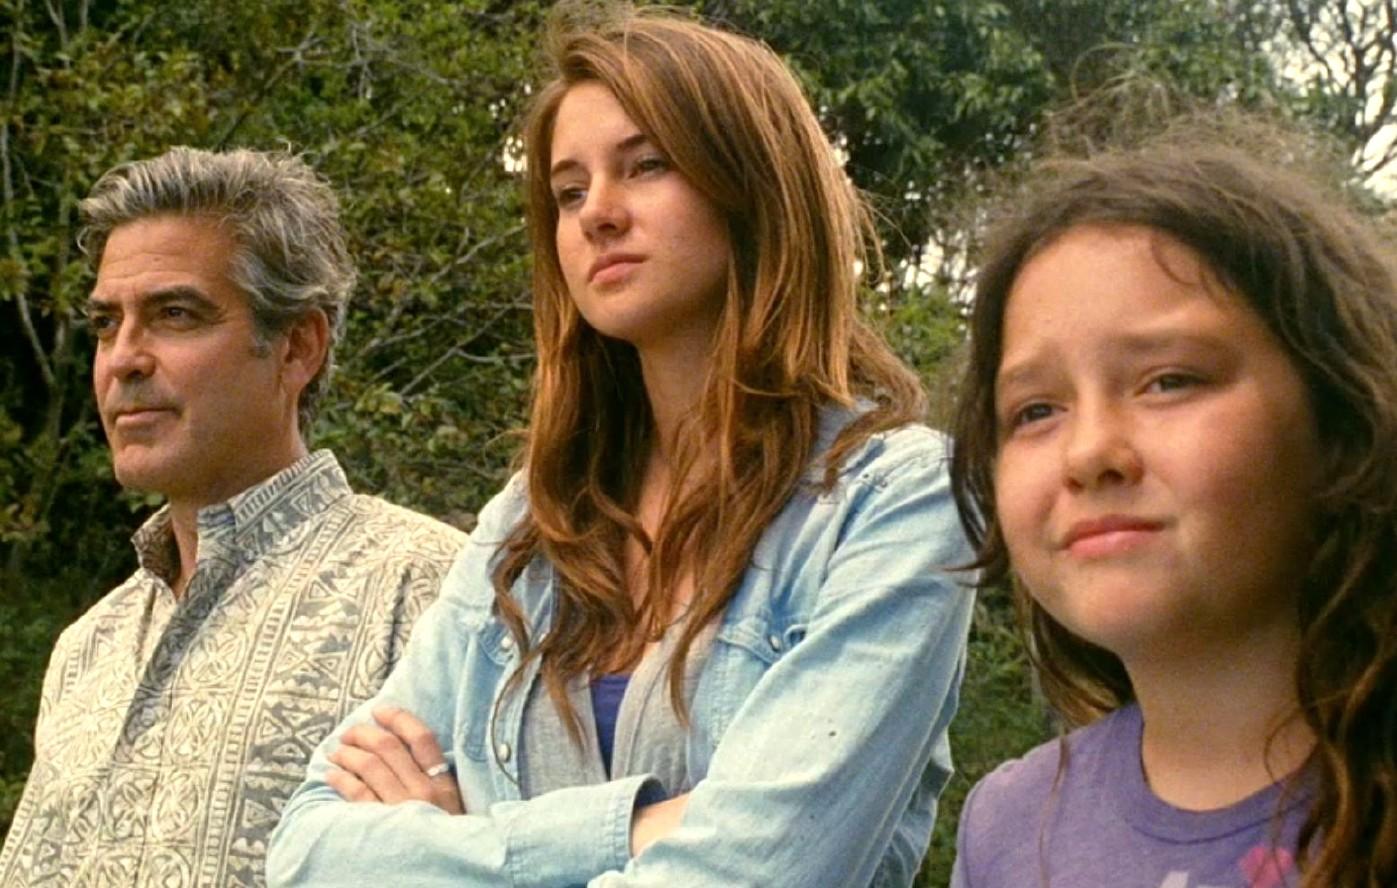 Oscar 2012 Winner Predictions: Adapted Screenplay